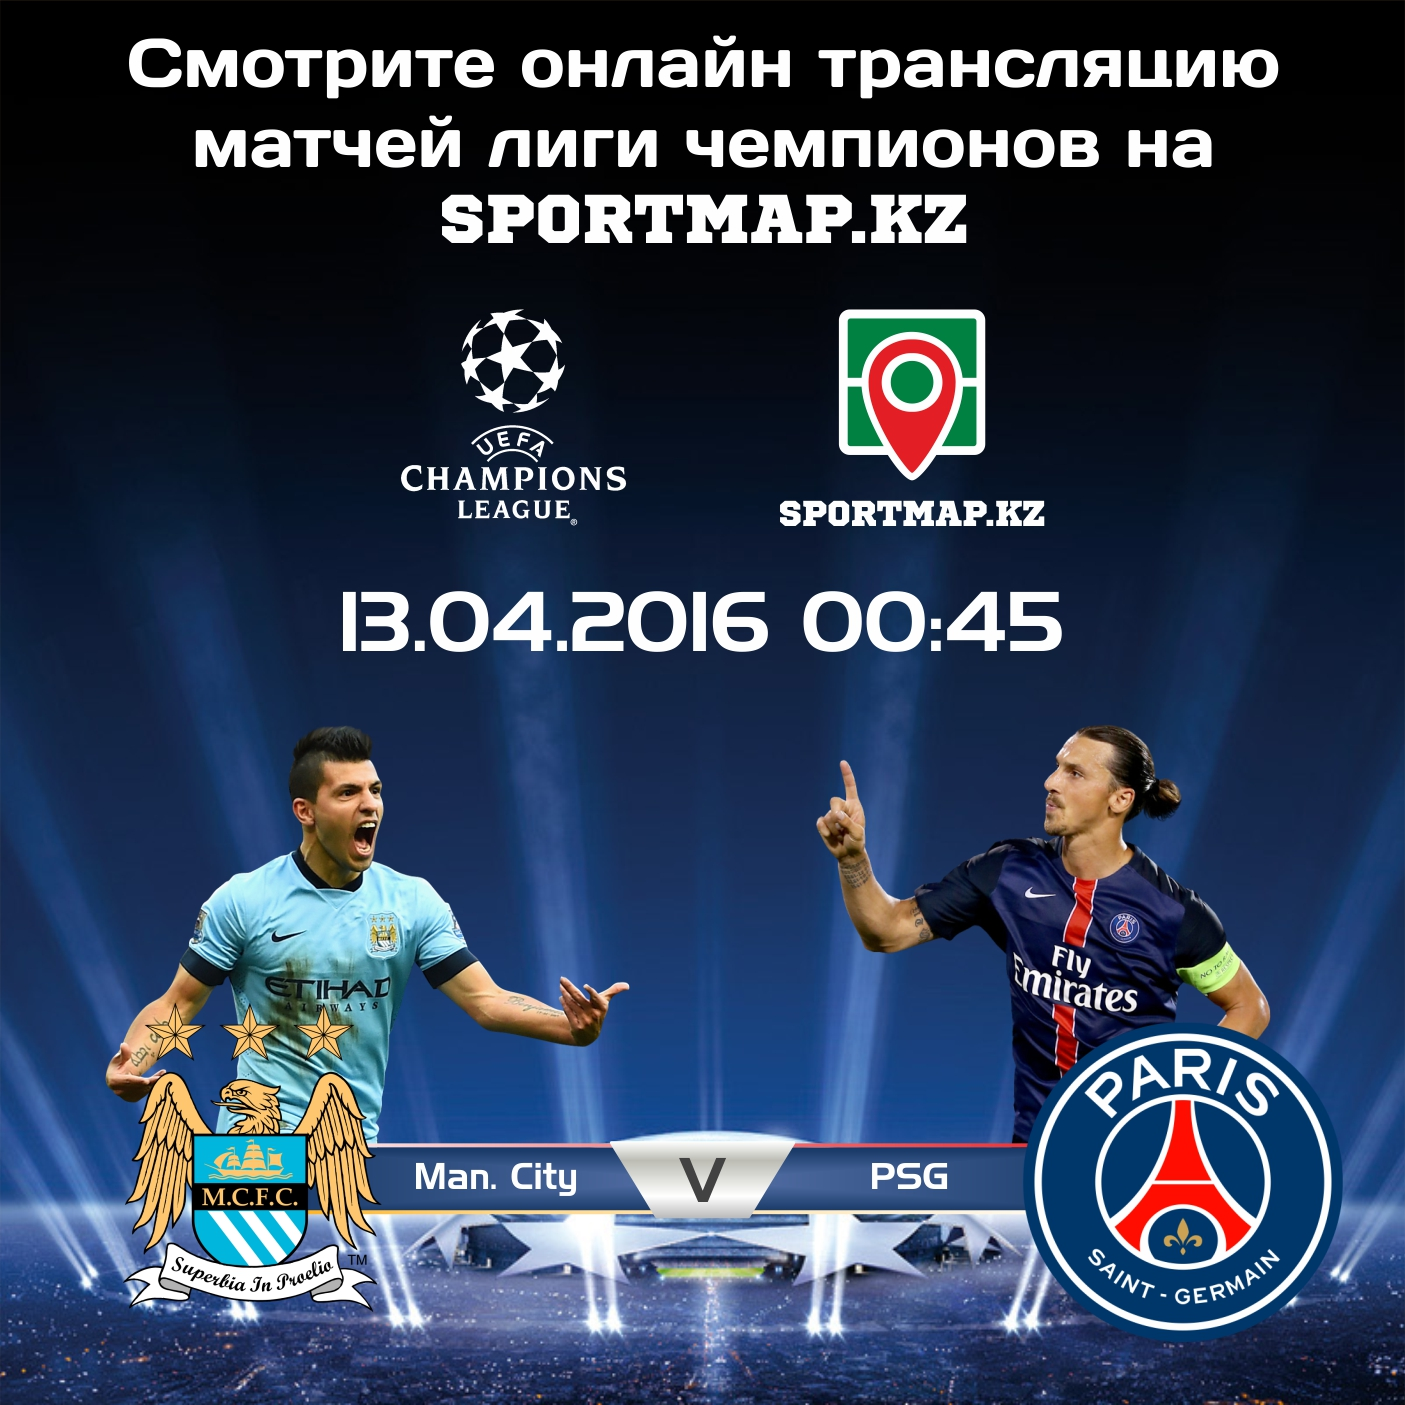 Смотреть онлайн прямую видео трансляцию матча Манчестер Сити - ПСЖ